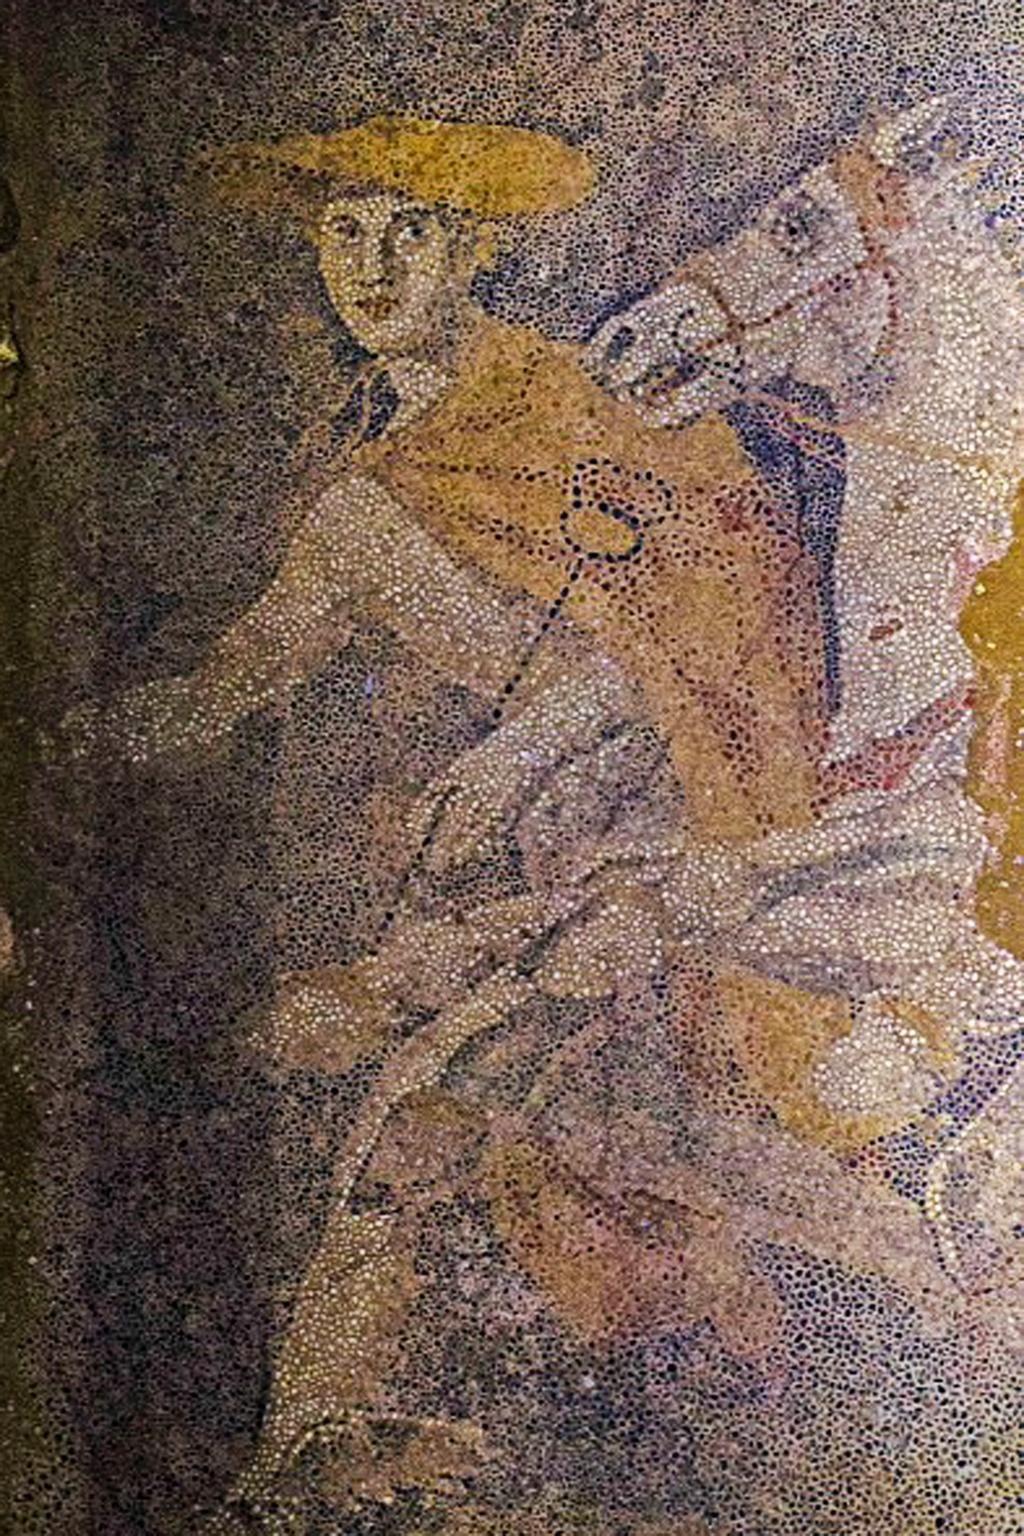 Amphipolis Greek Tomb: Excavated Mosaic Floor Features ...